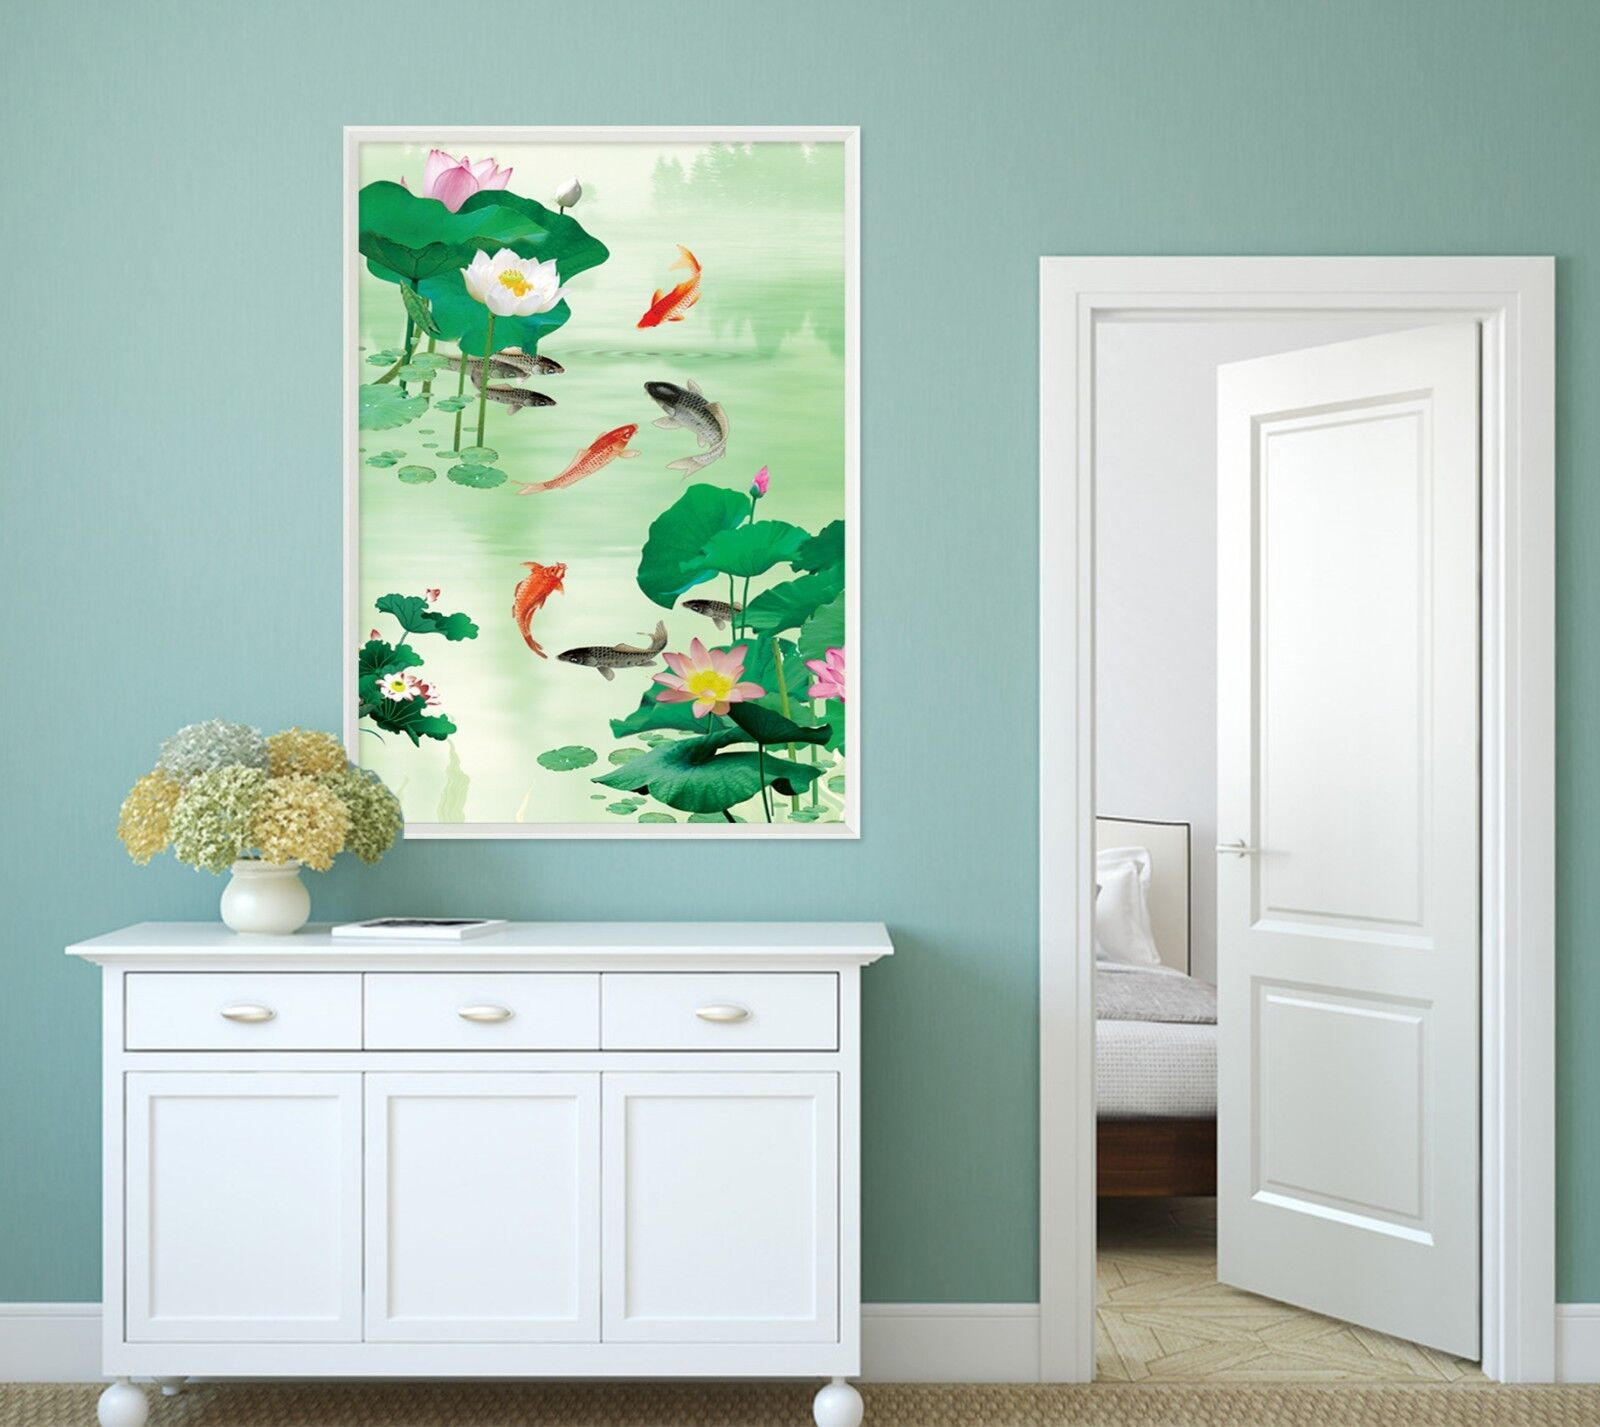 3D Lotus Pond Fish 47 Framed Poster Home Decor Print Painting Art AJ